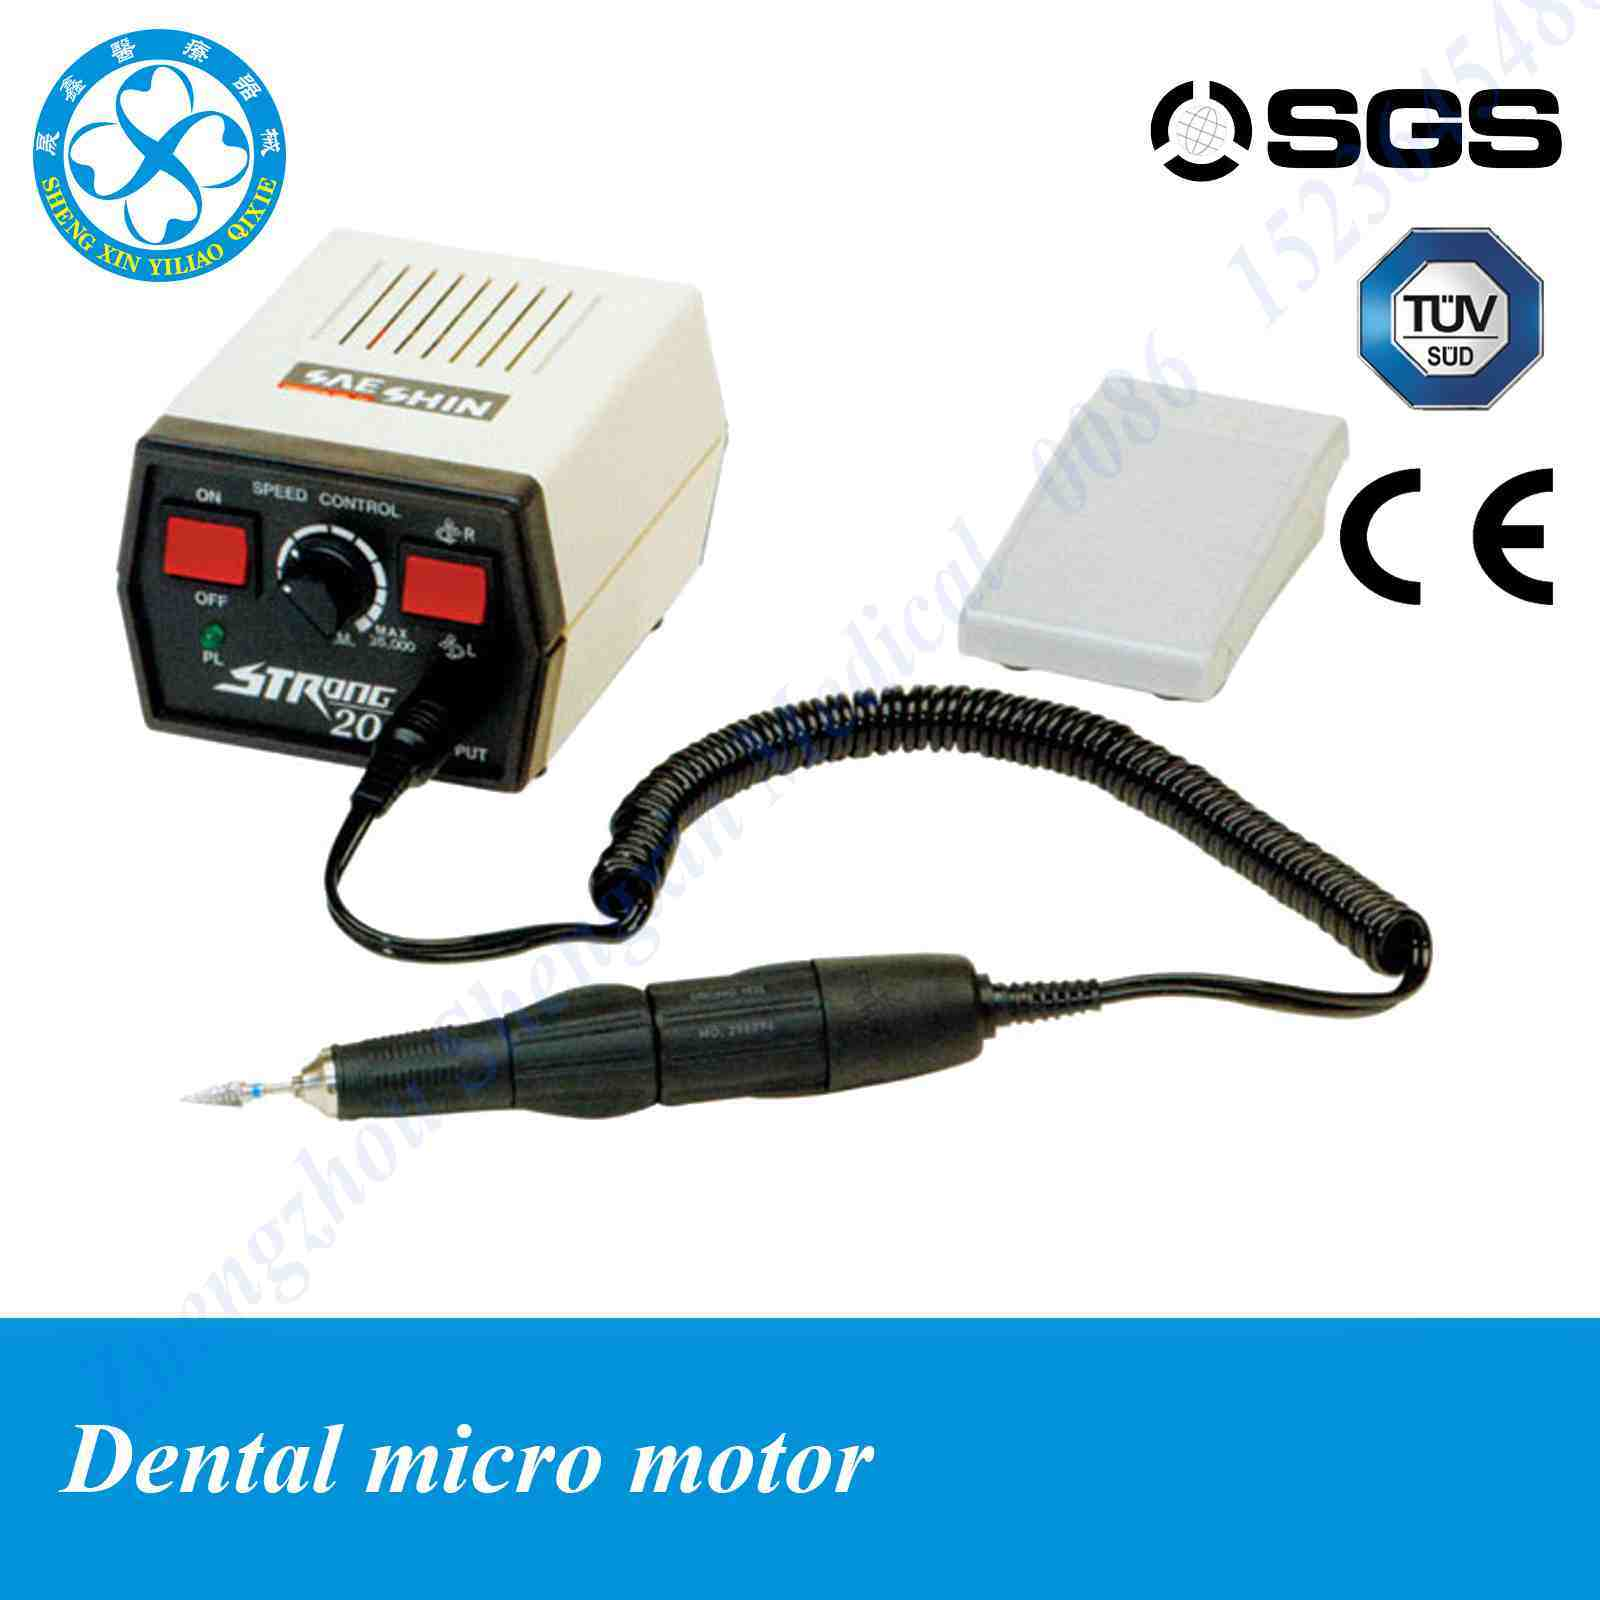 Handpiece 35000rpm strong 204 dental micromotor for Micro motor handpiece dental